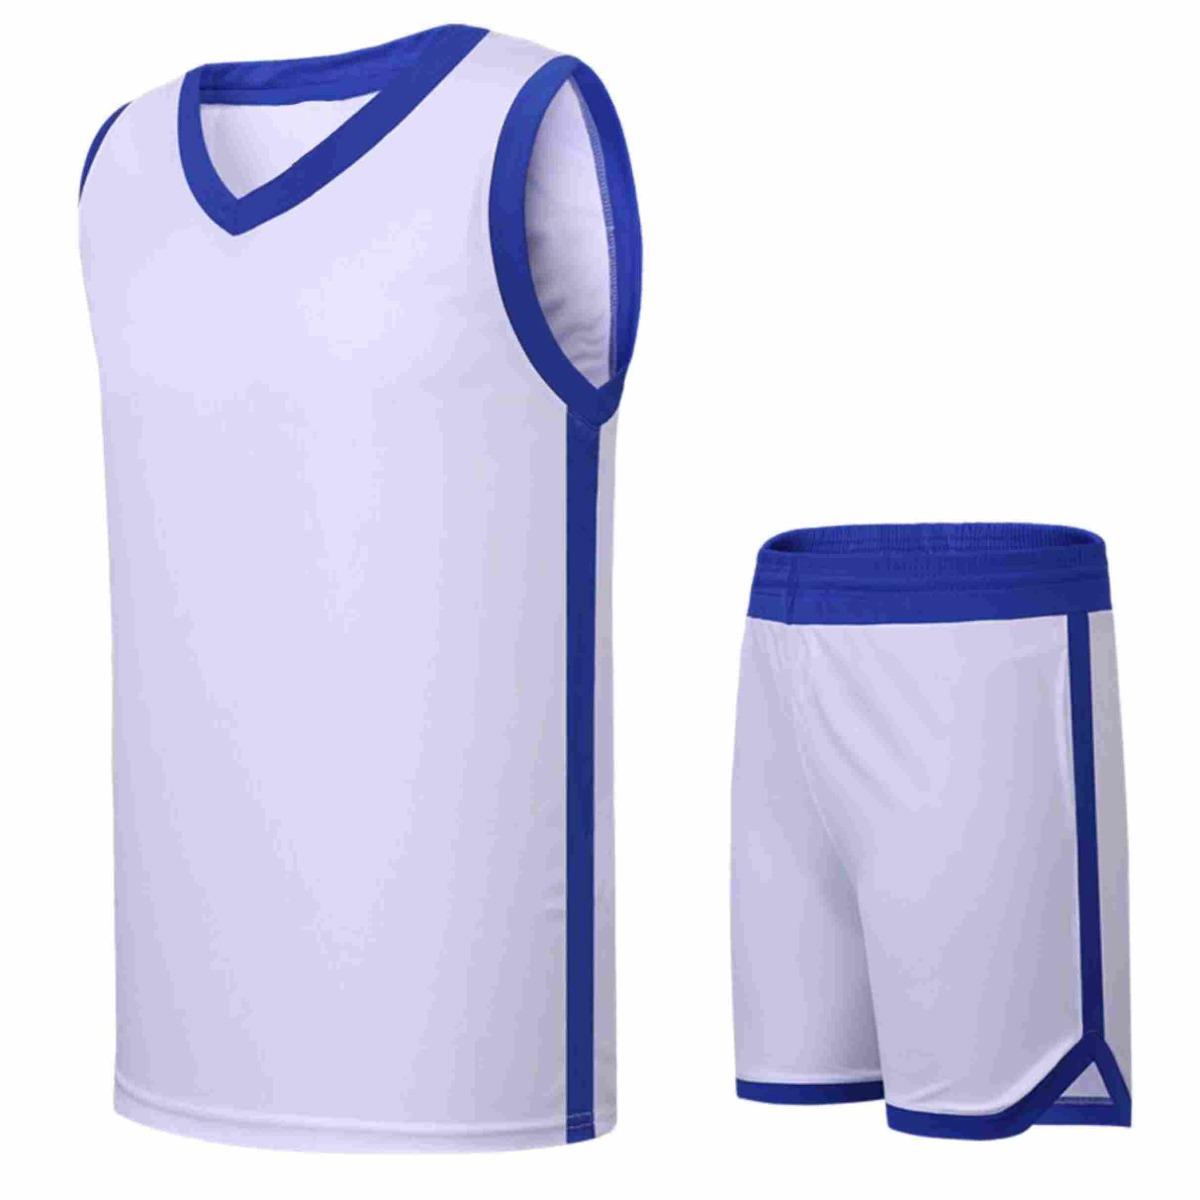 Uniformes De Basquetbol De Basketball De Fabrica - $ 160